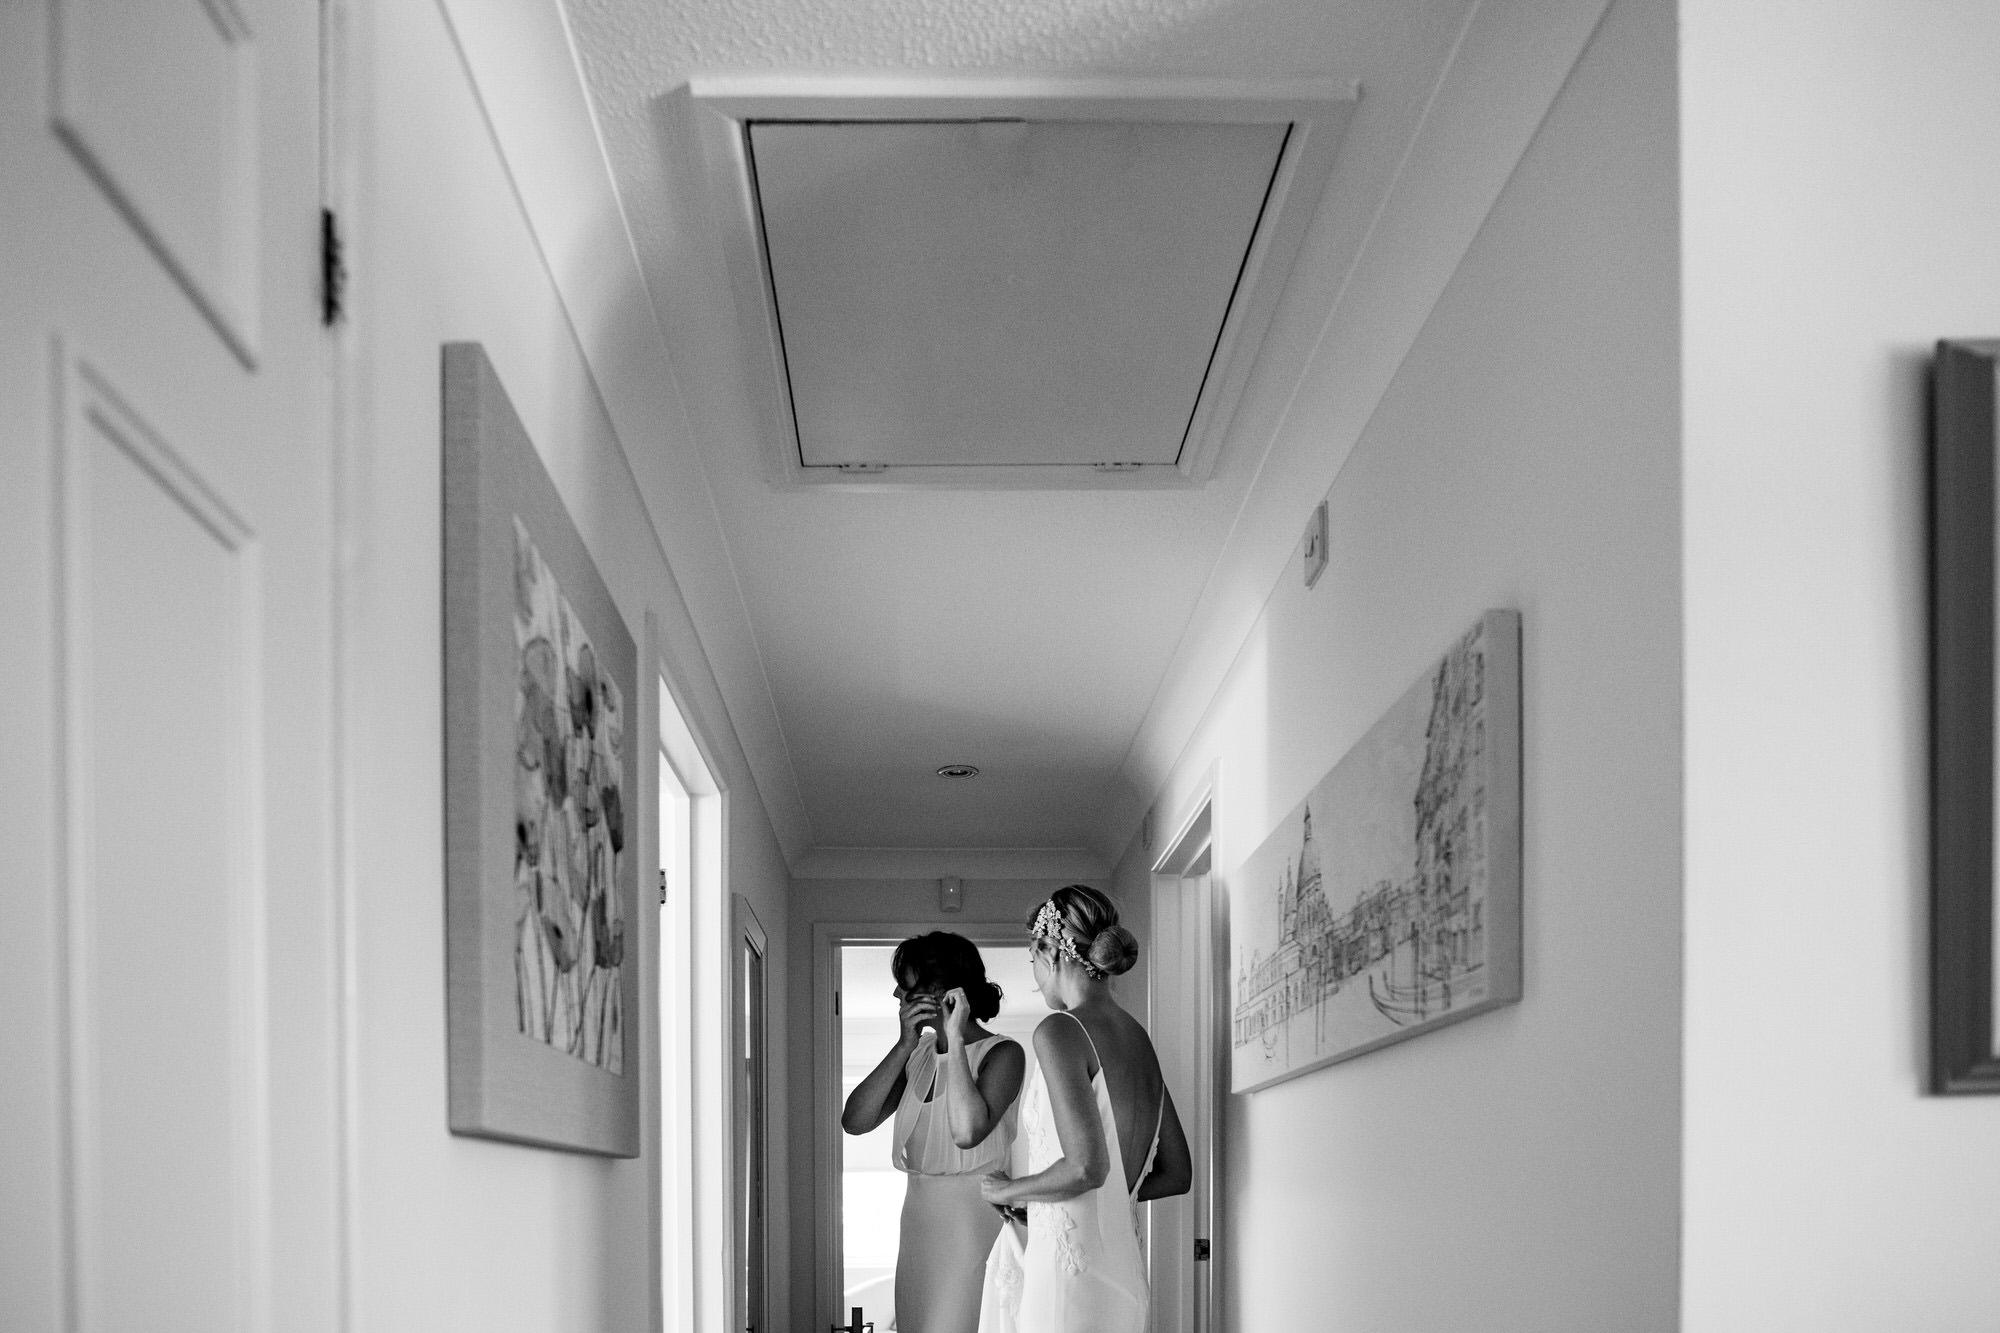 Dorset marquee wedding by the sea simon biffen photography 5